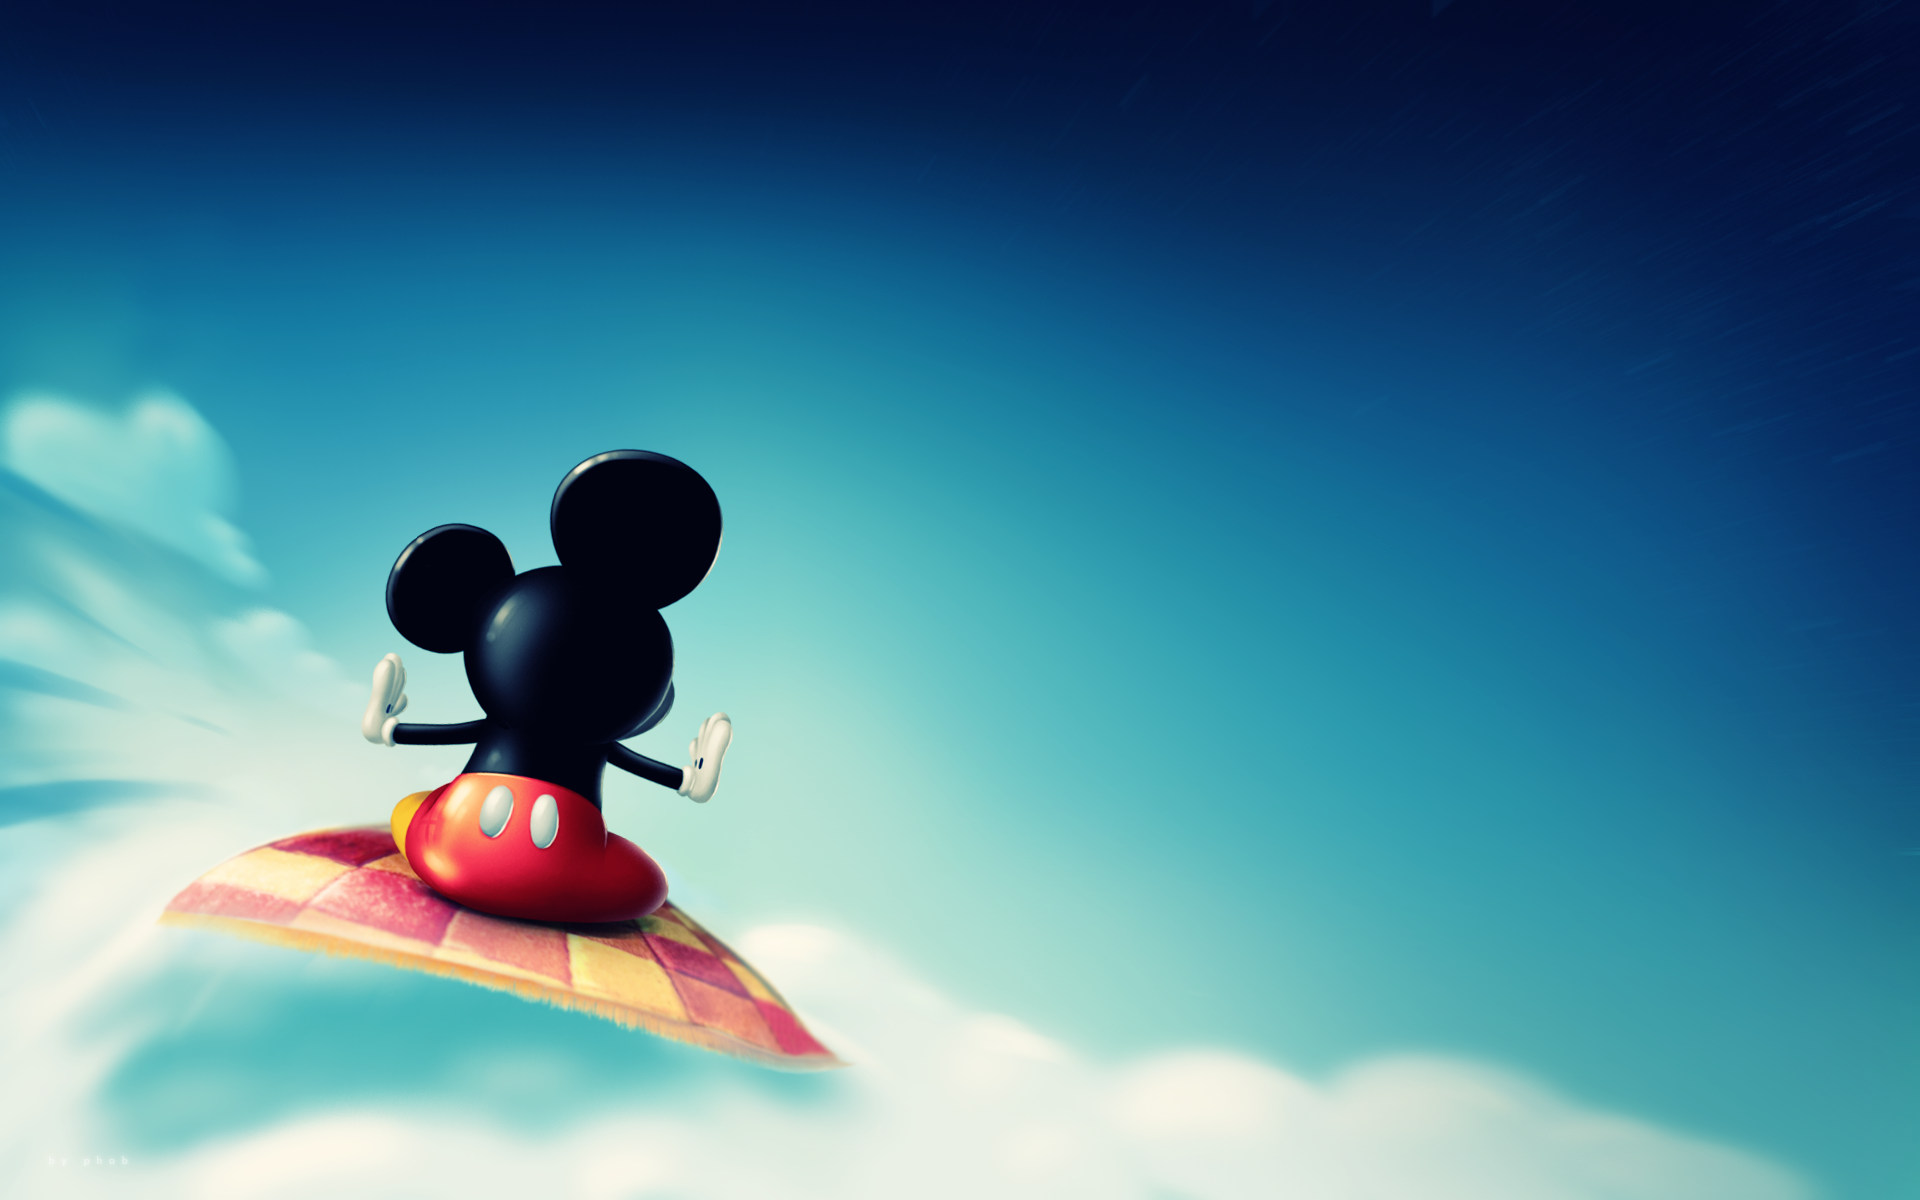 HD Wallpaper Disney Download 1920x1200